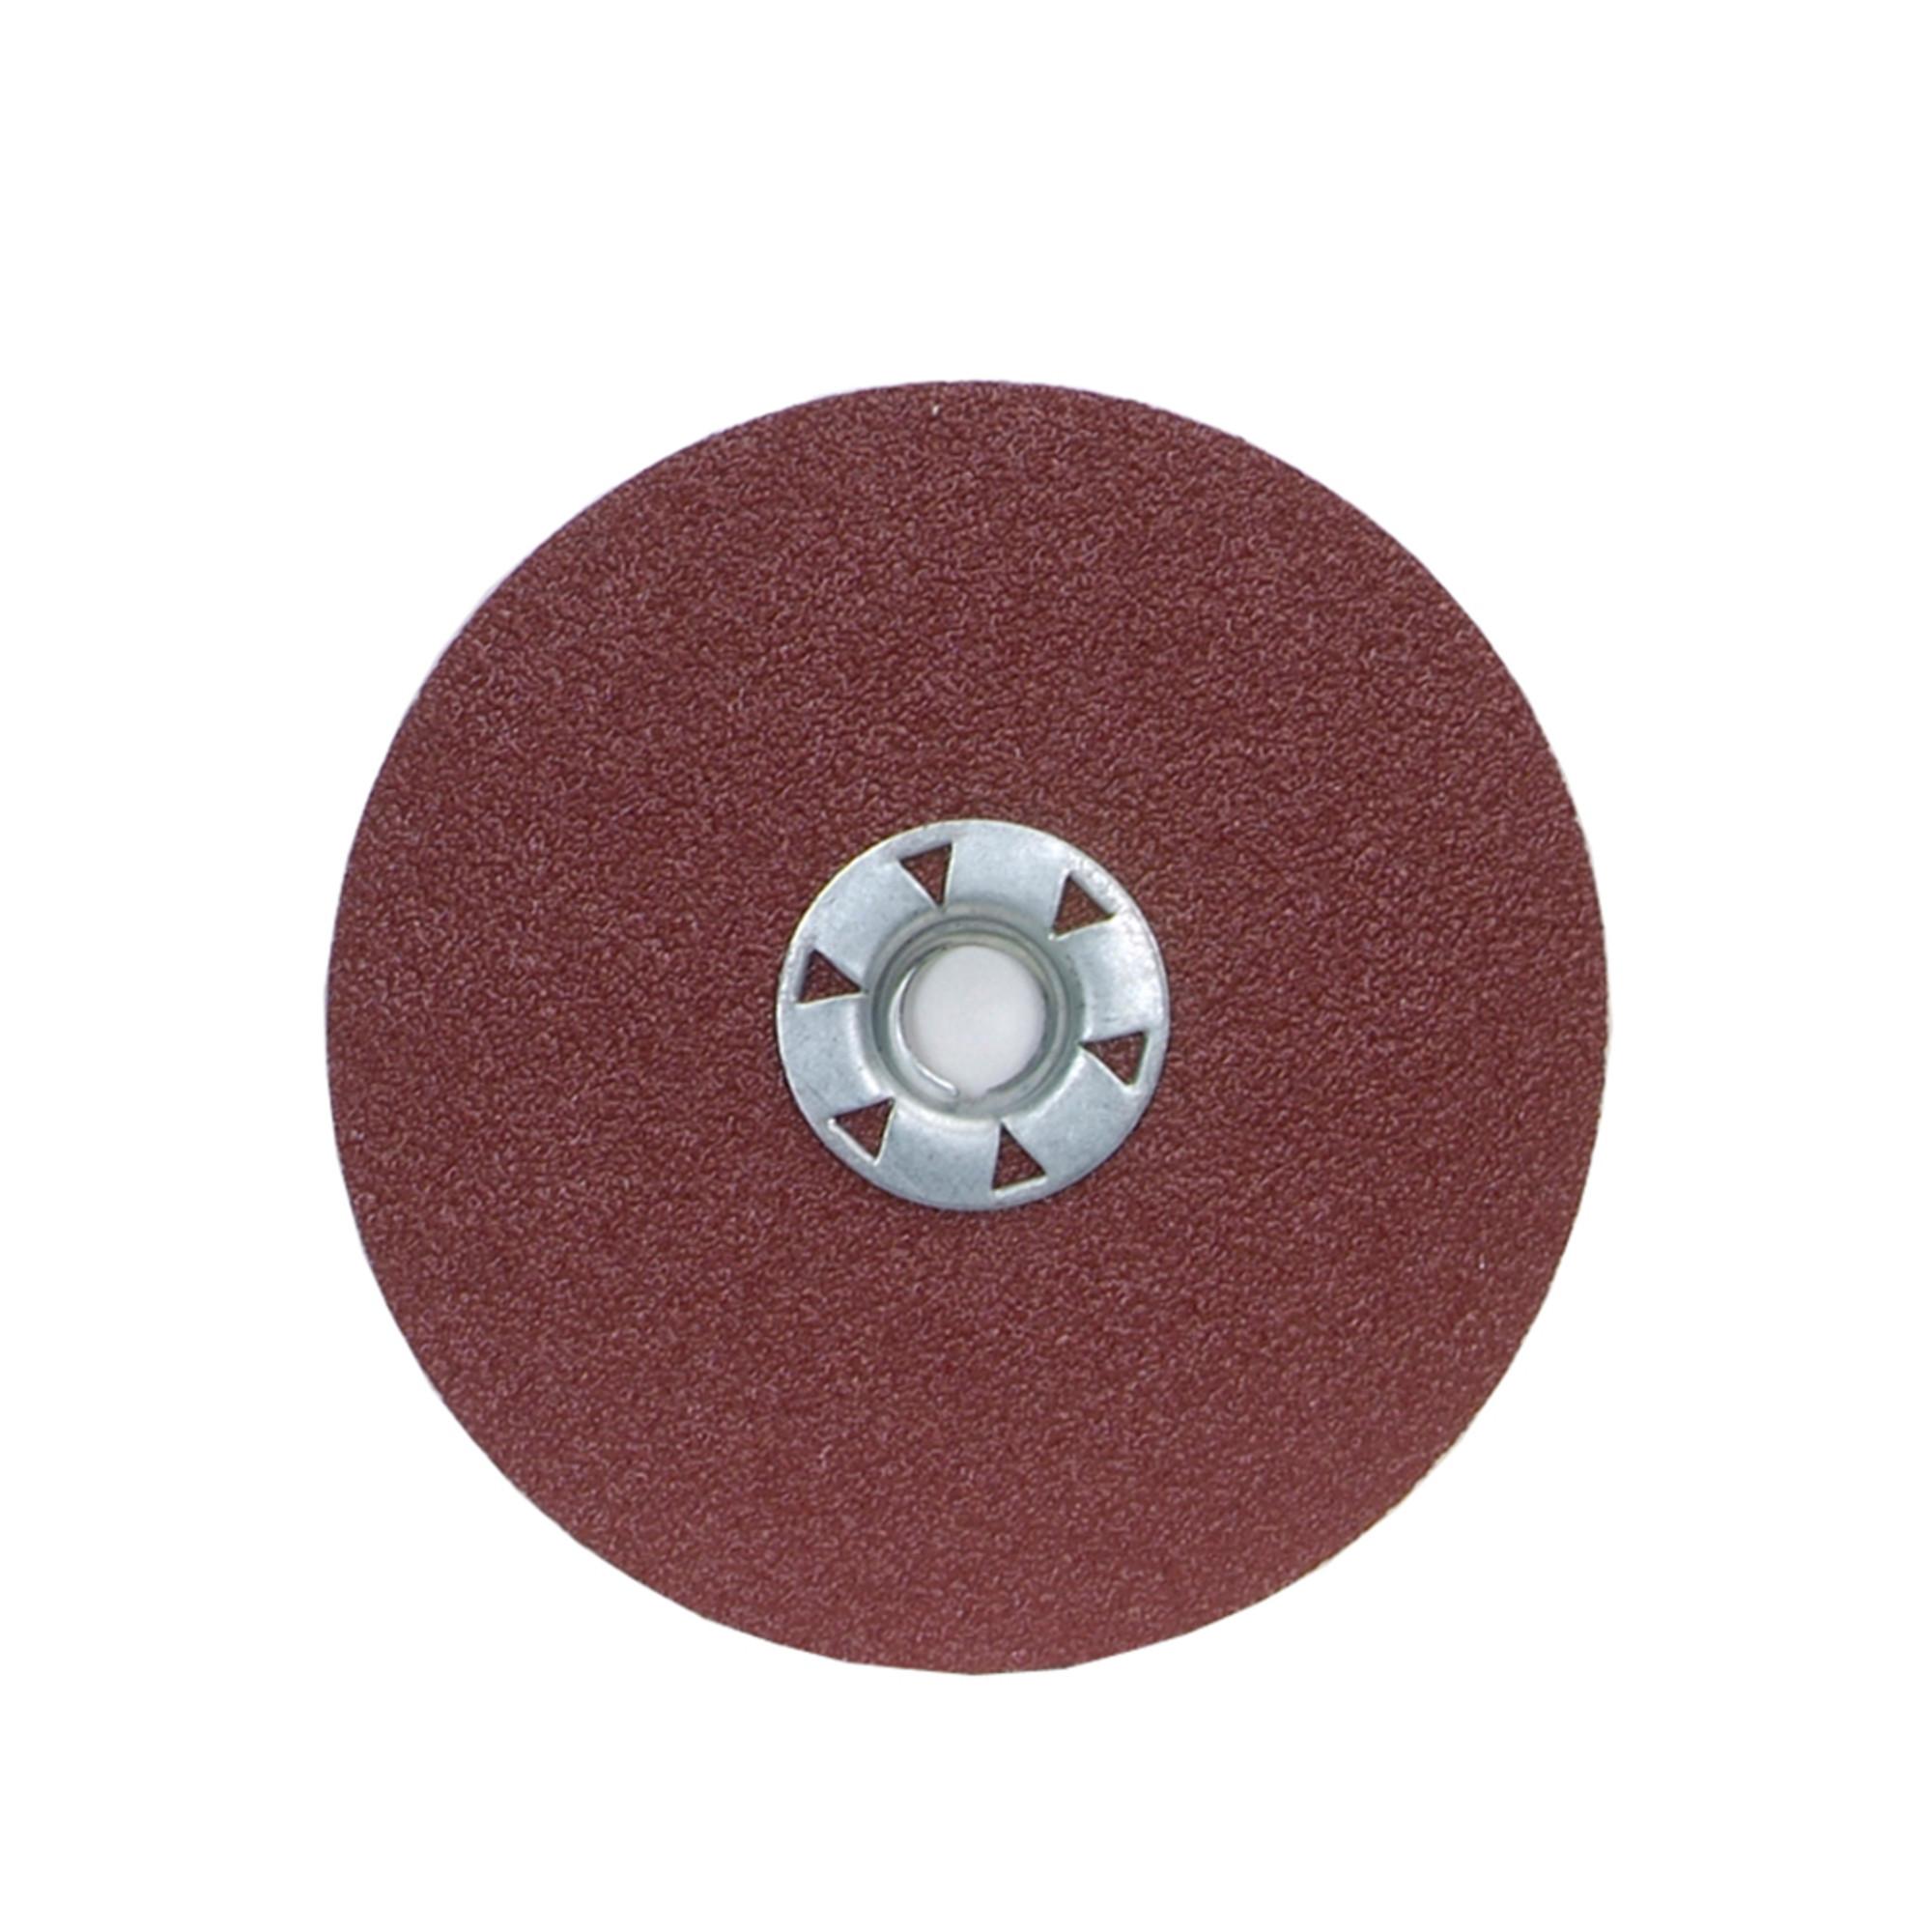 Norton 66261138761 Power Sander Fiber Backed Discs Size 7 x 5/8-11 S/C 80 Grit